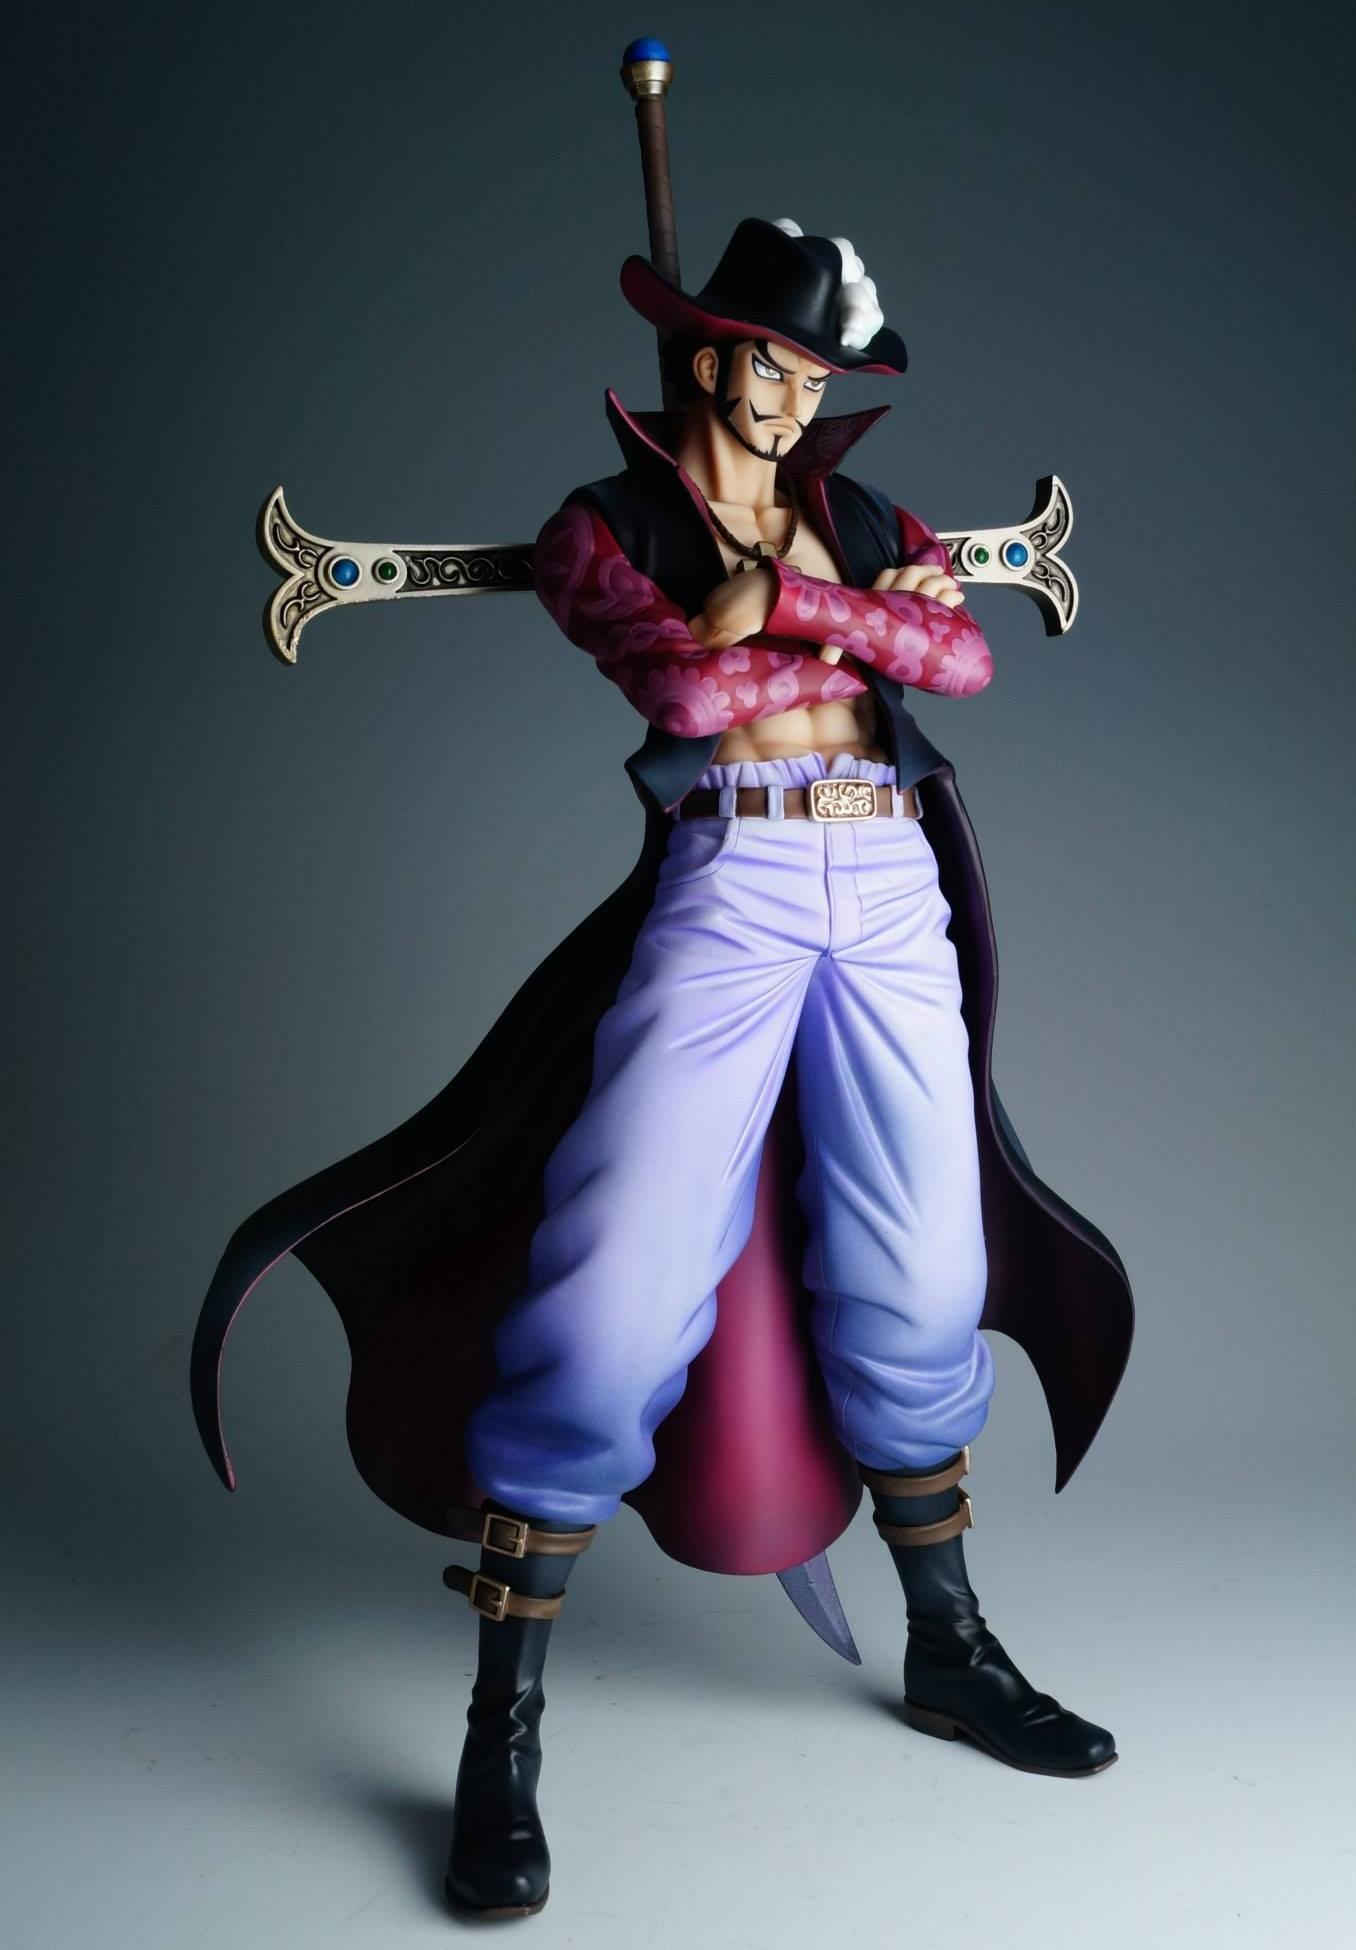 One-Piece-POP-Neo-DX-Hawkeye-Mihawk-Ver.-2-Figure-e1383236414347